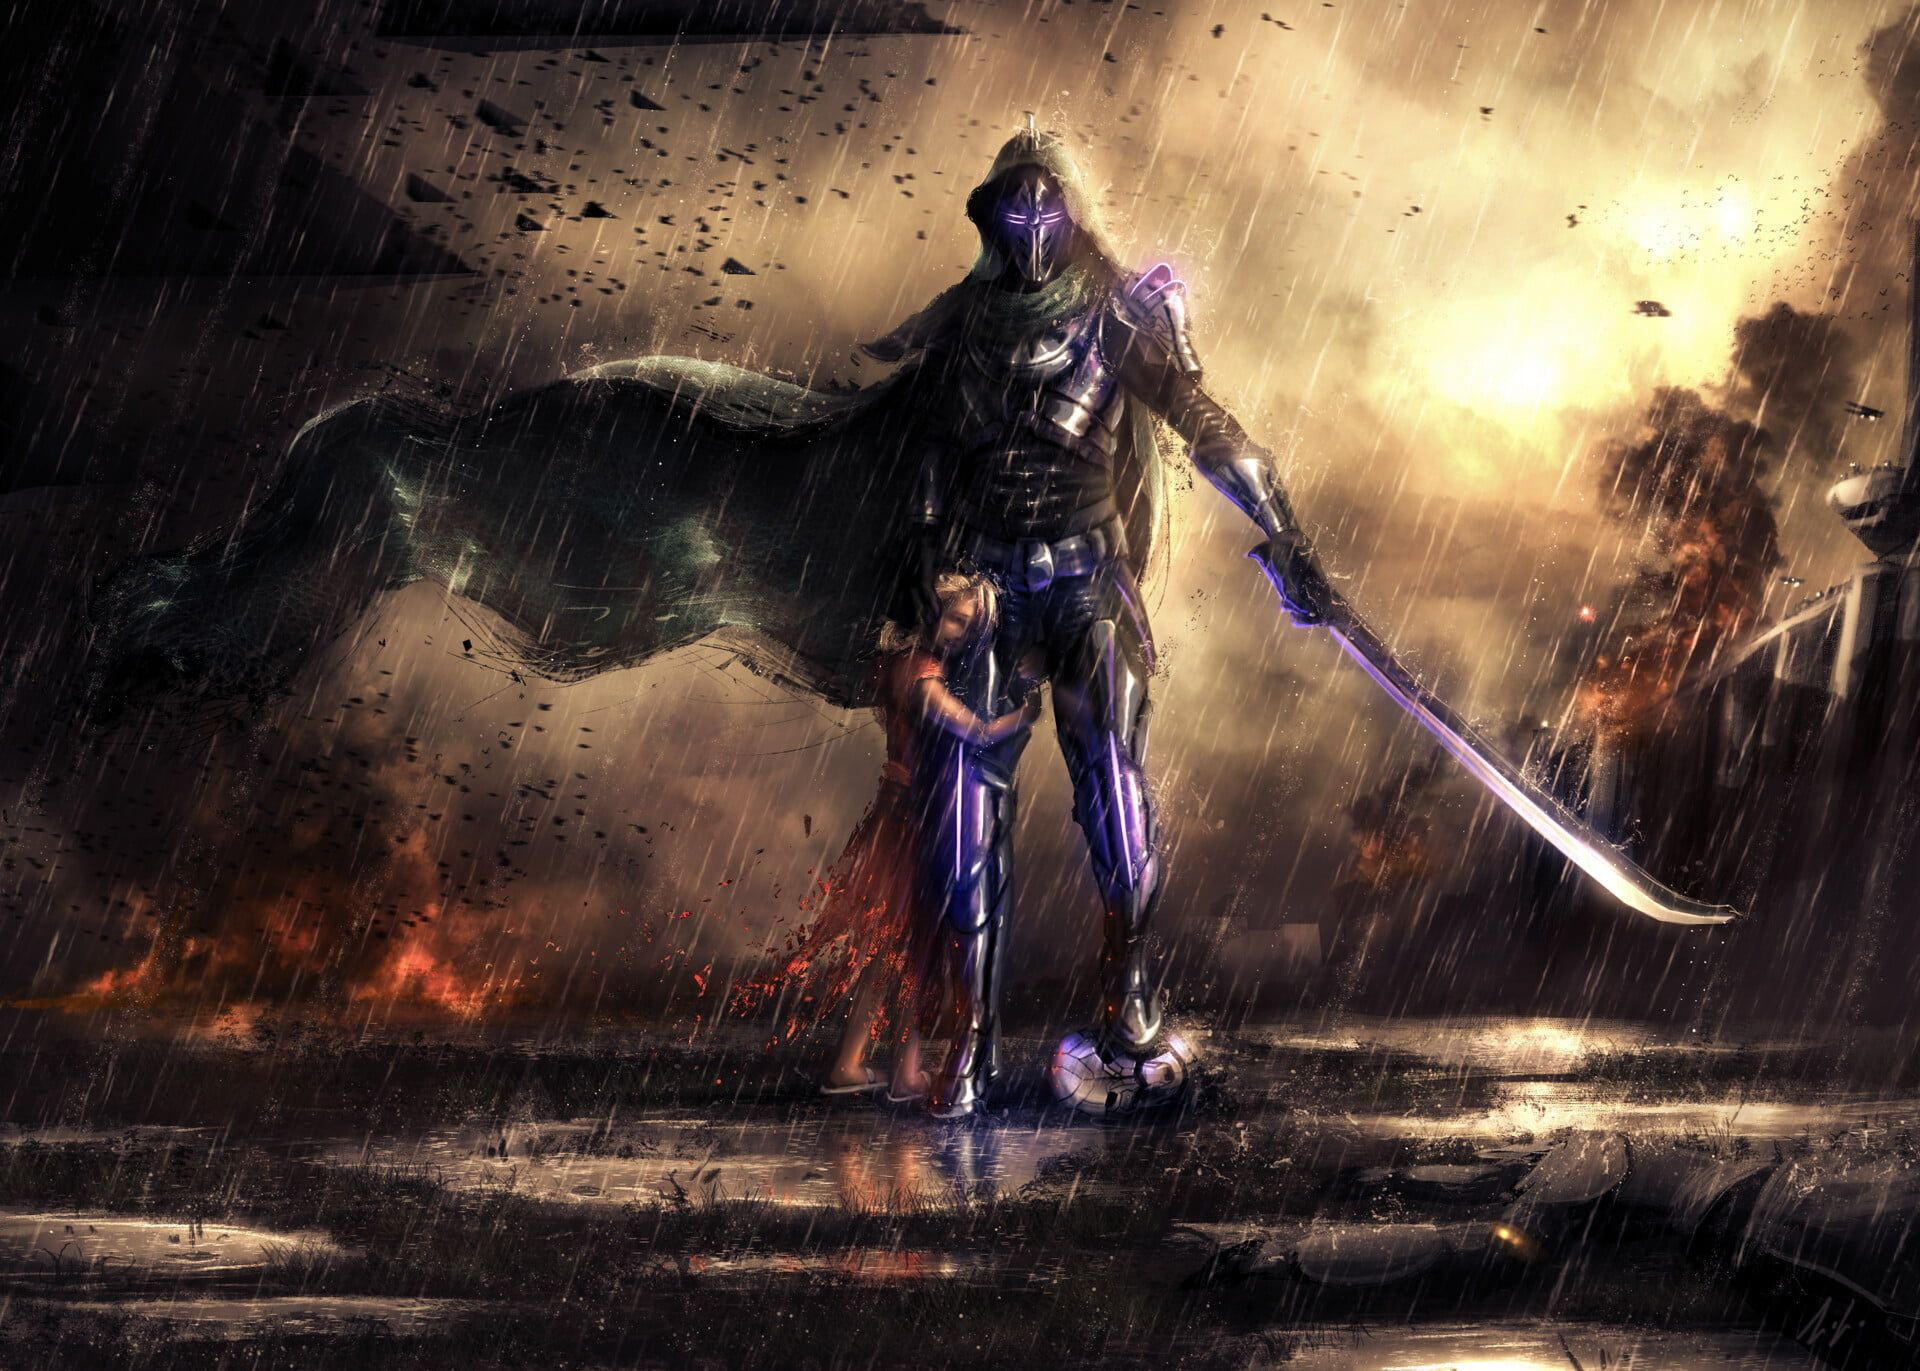 Destiny Destiny 2 Fan Art Hunter Destiny Rain 1080p Wallpaper Hdwallpaper Desktop Destiny Hunter Destiny Backgrounds Destiny Comic